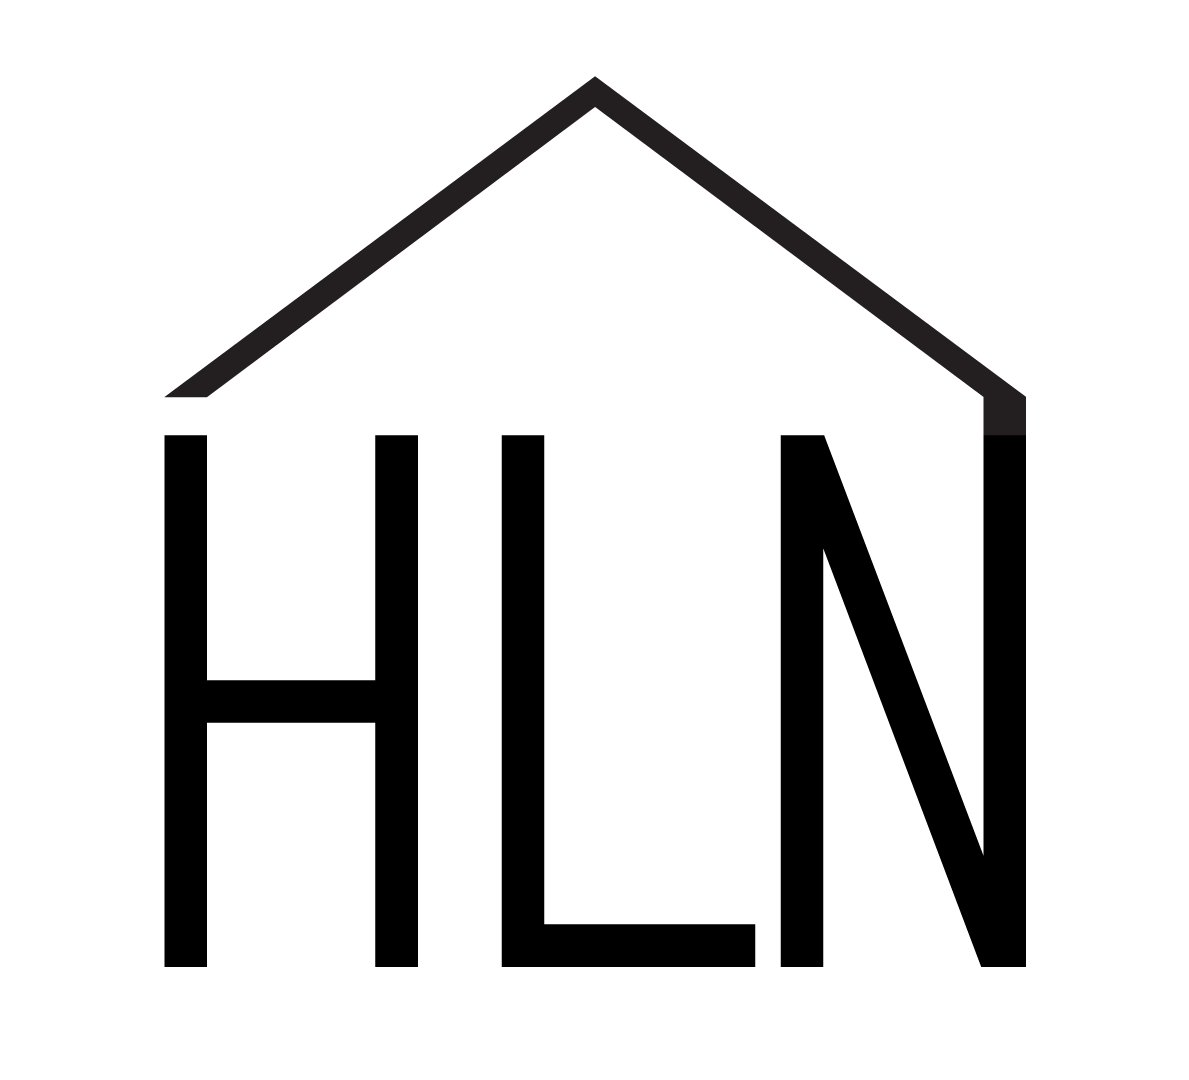 House Line